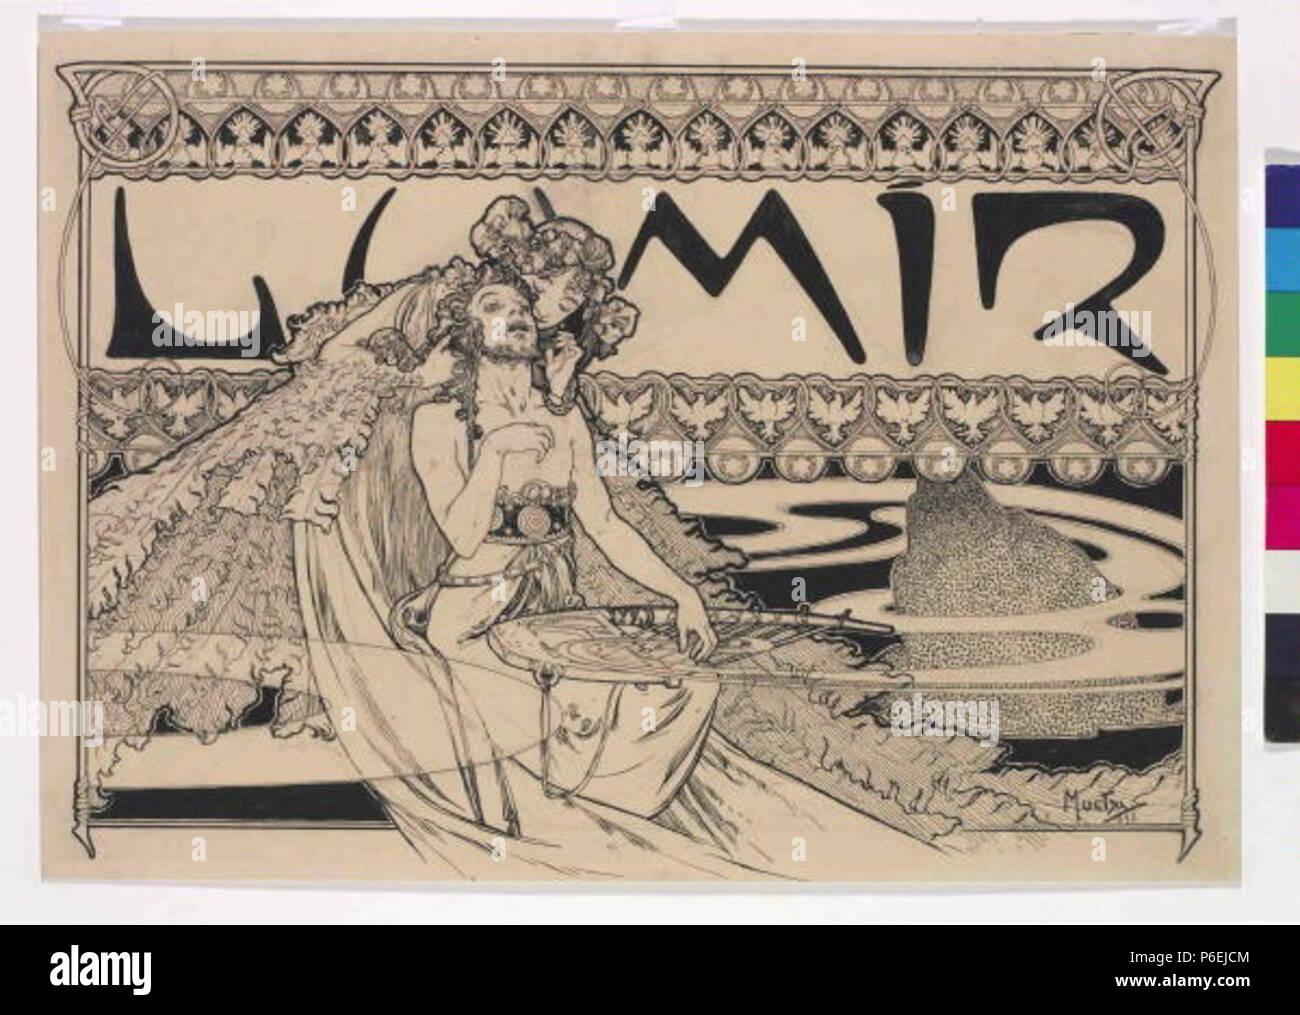 .: Záhlaví eština asopisu Lumír 1898 6 Autor Alfons Mucha 24.7.1860-14.7.1939 - Zahlavi casopisu Lumir Foto de stock